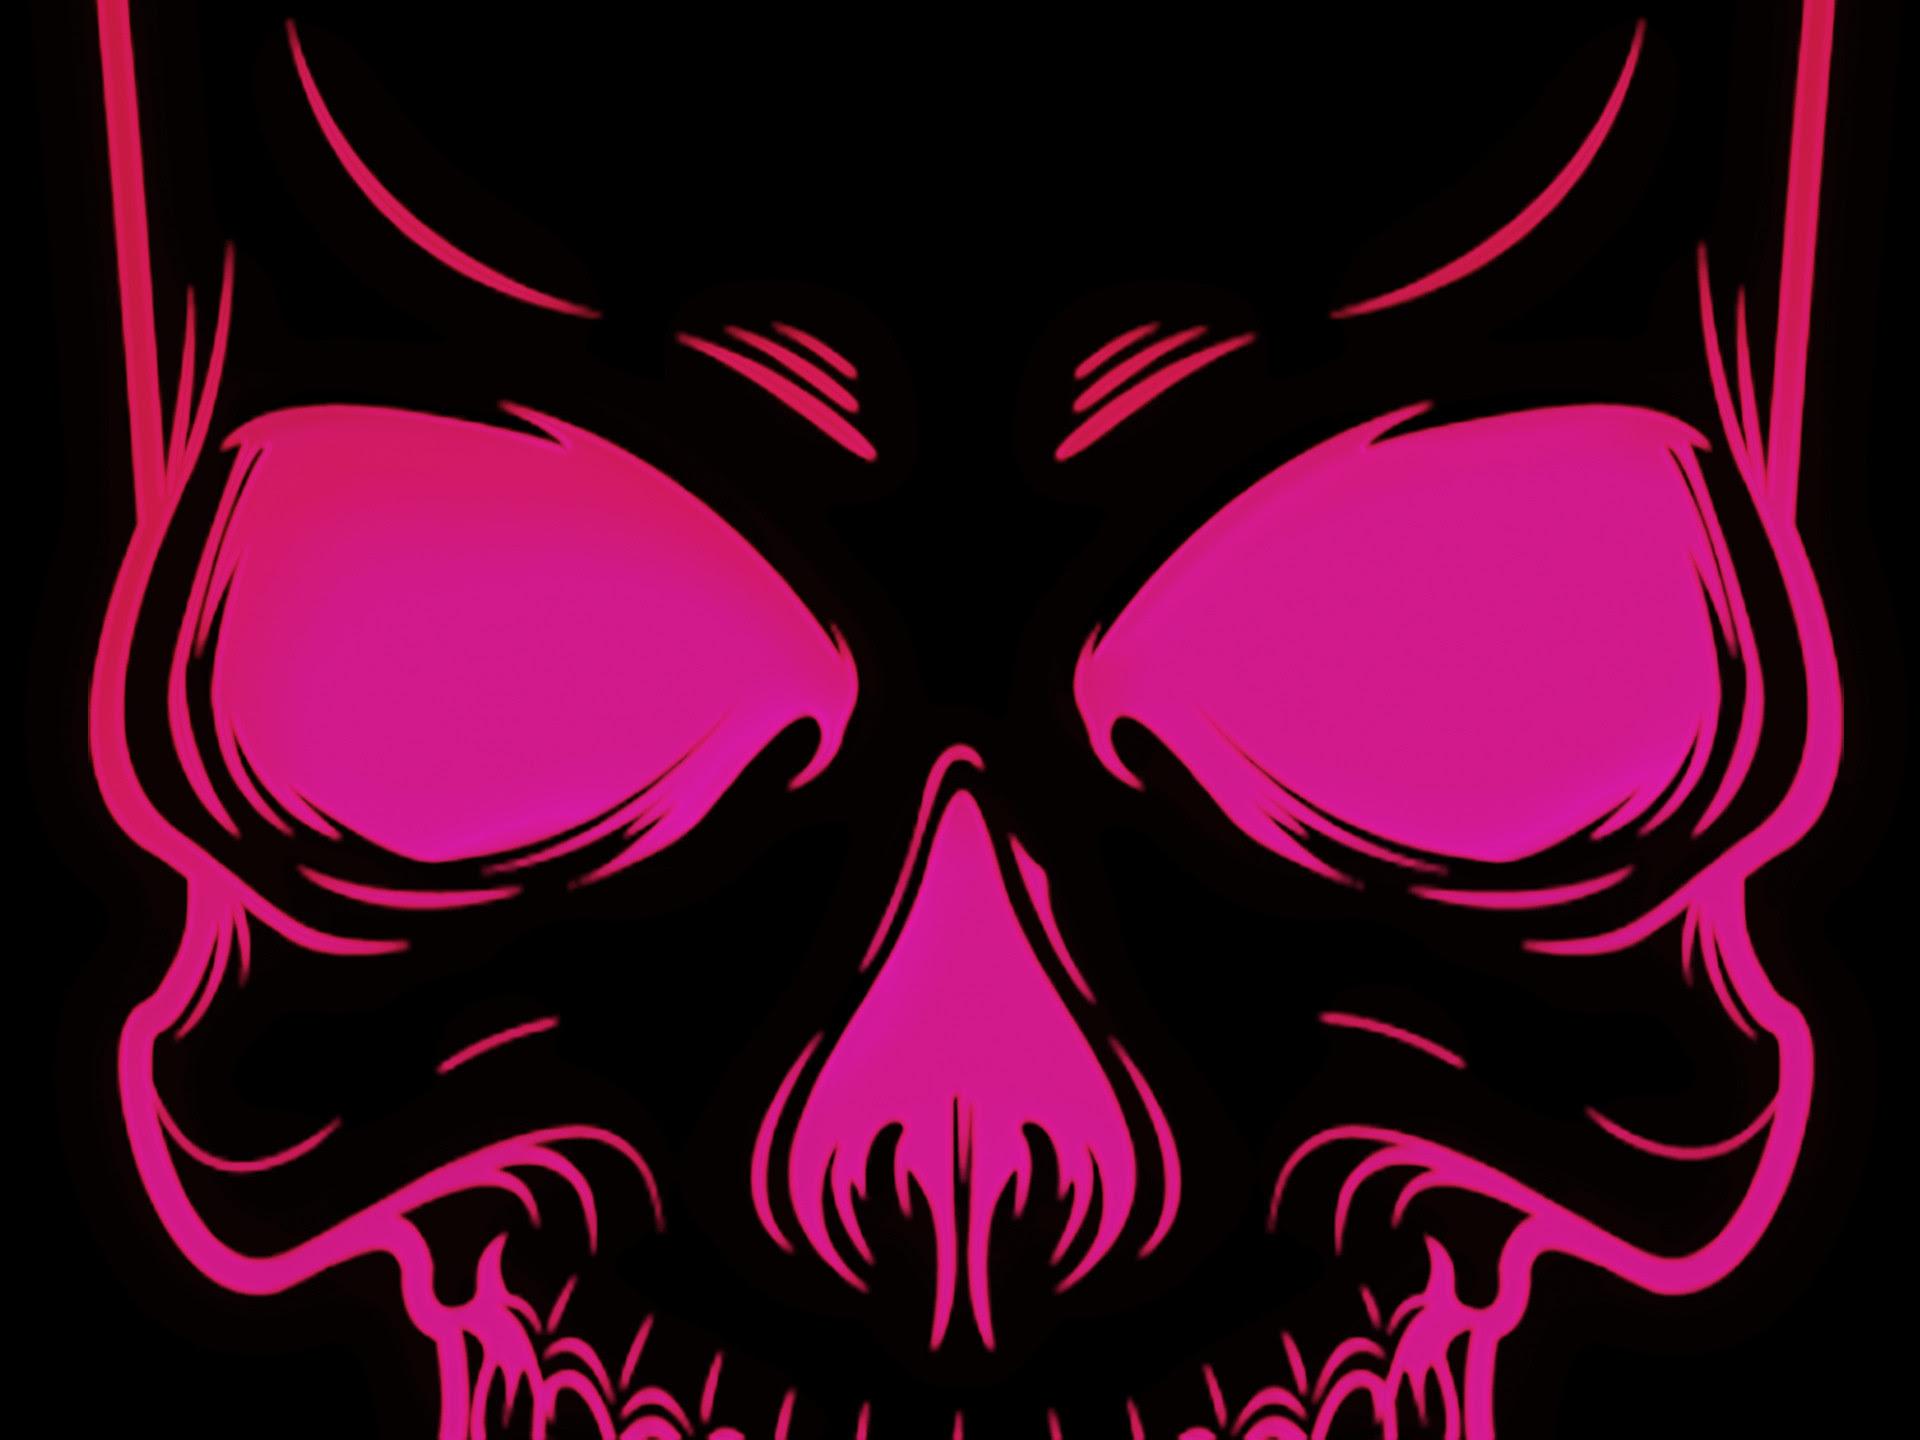 Pink Skull Wallpaper 50 Images